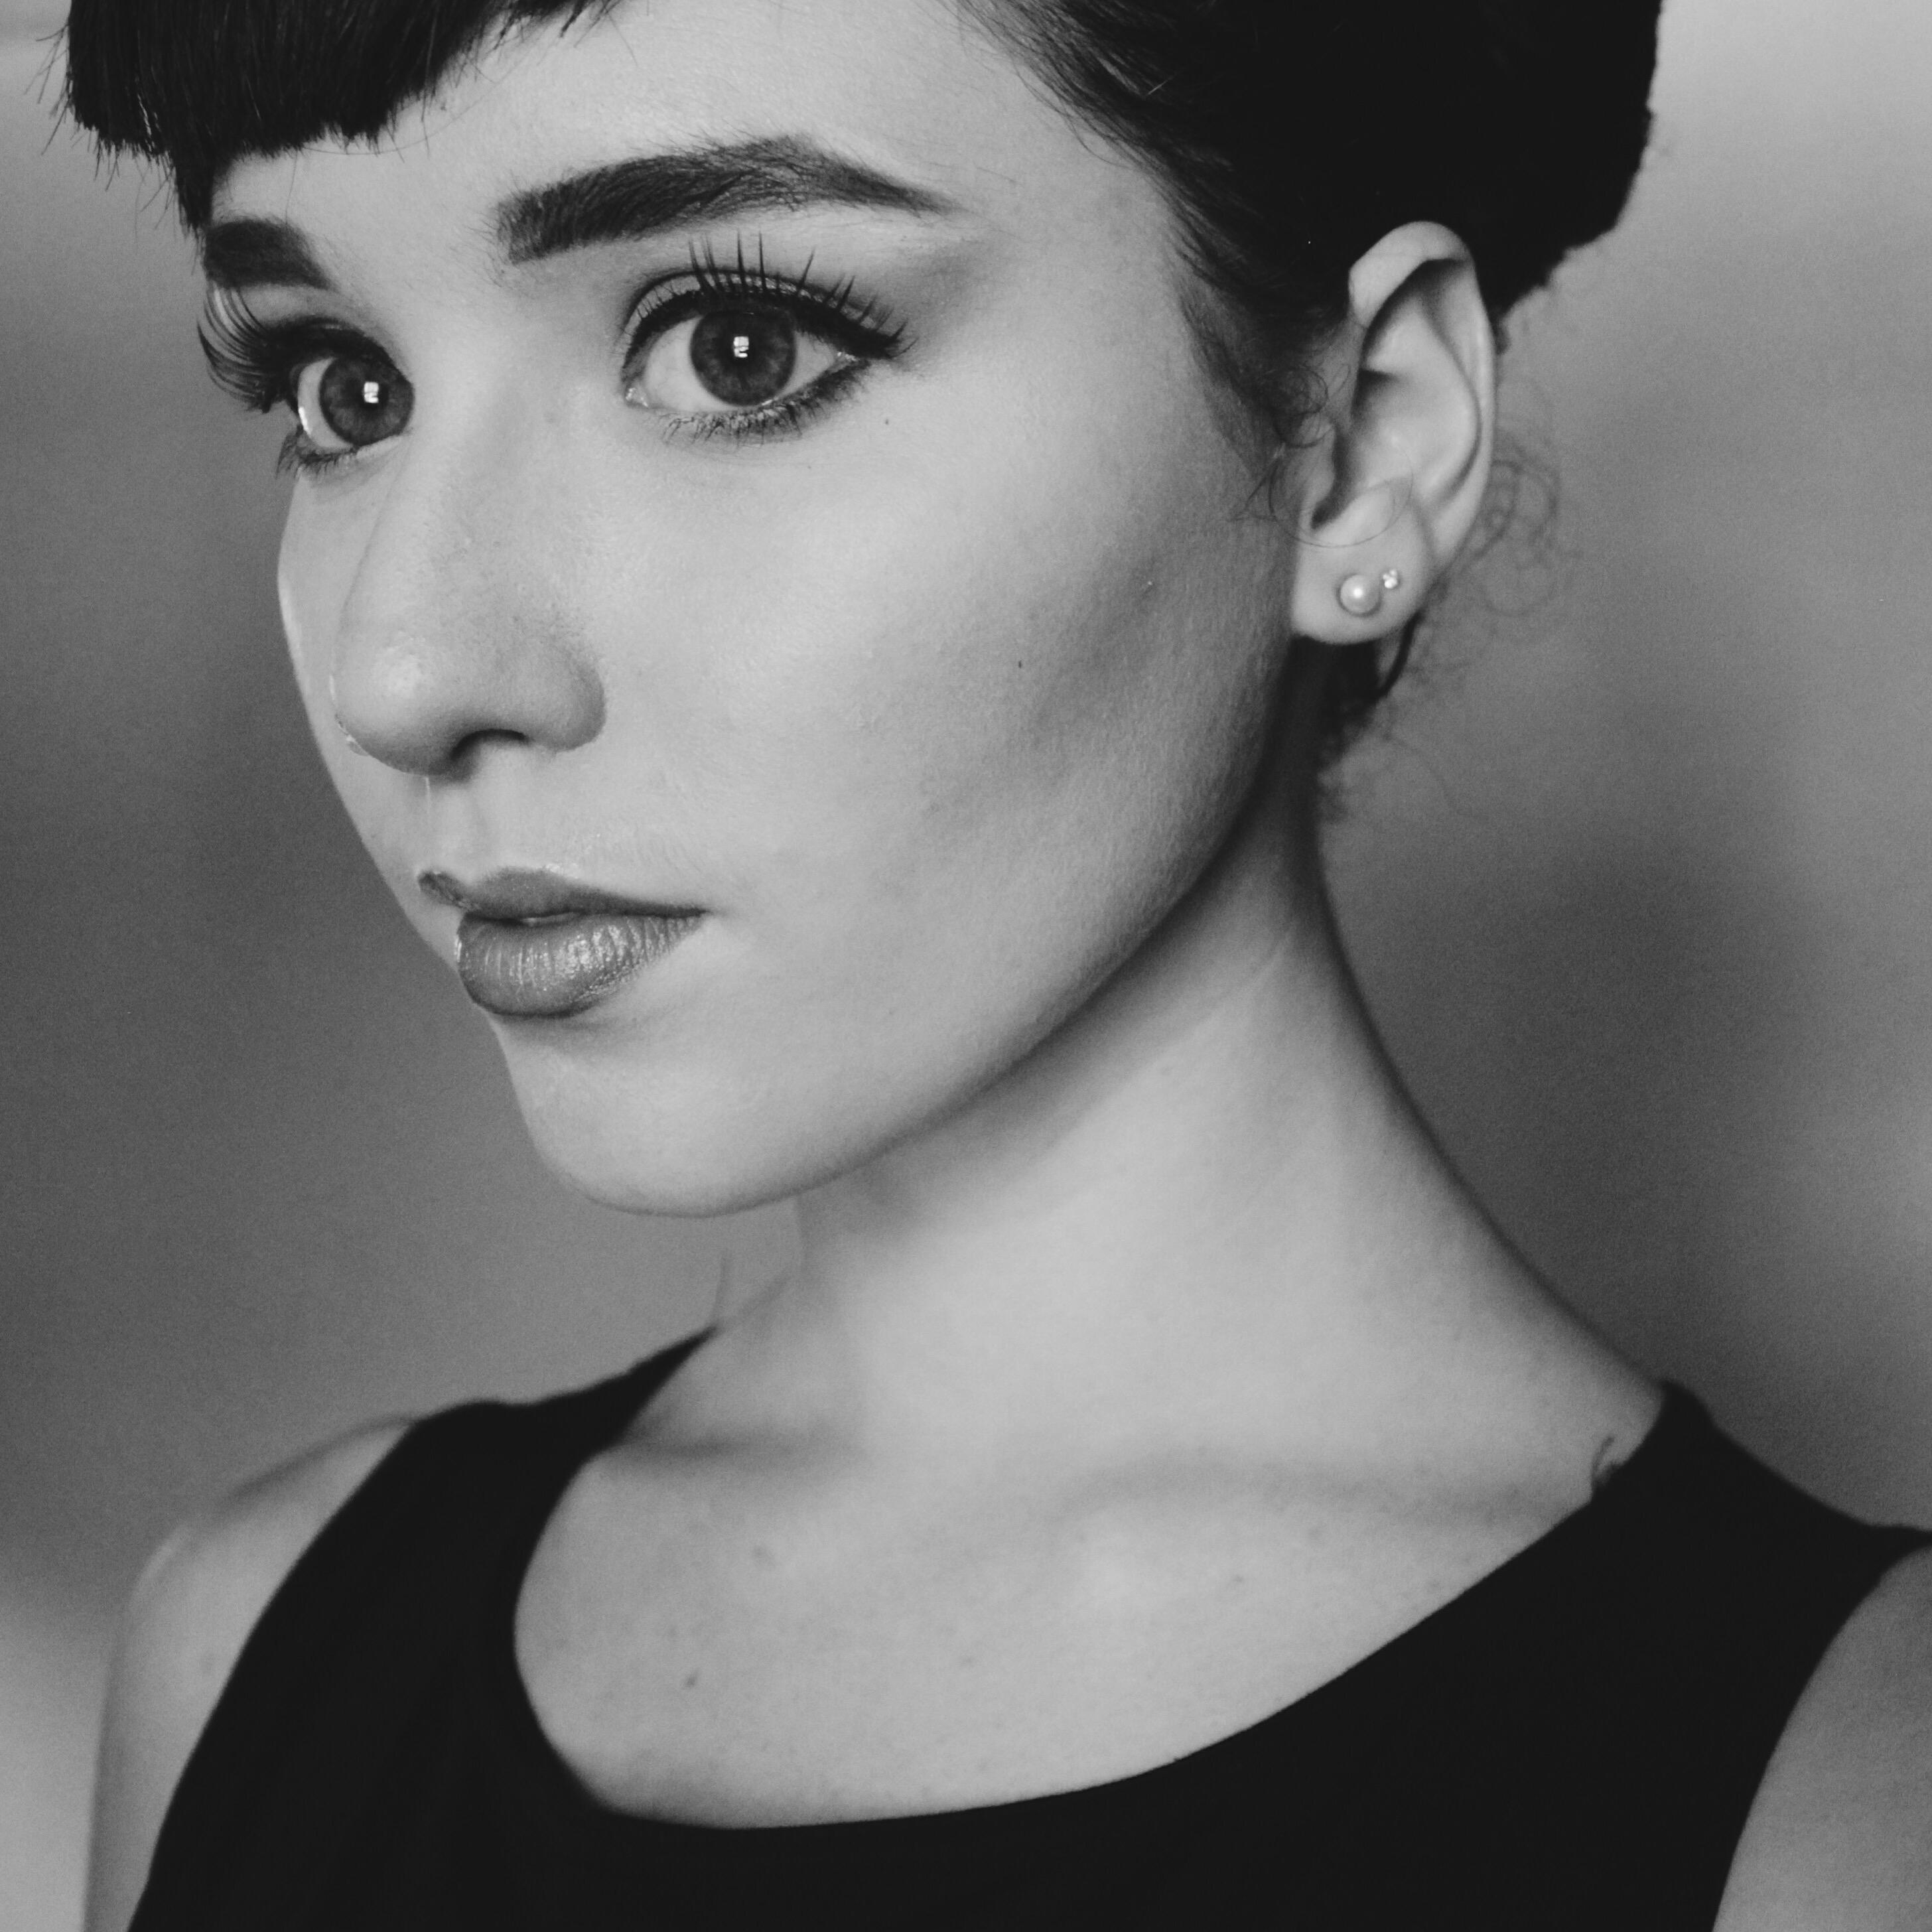 Audrey Hepburn Thrifts And Prints